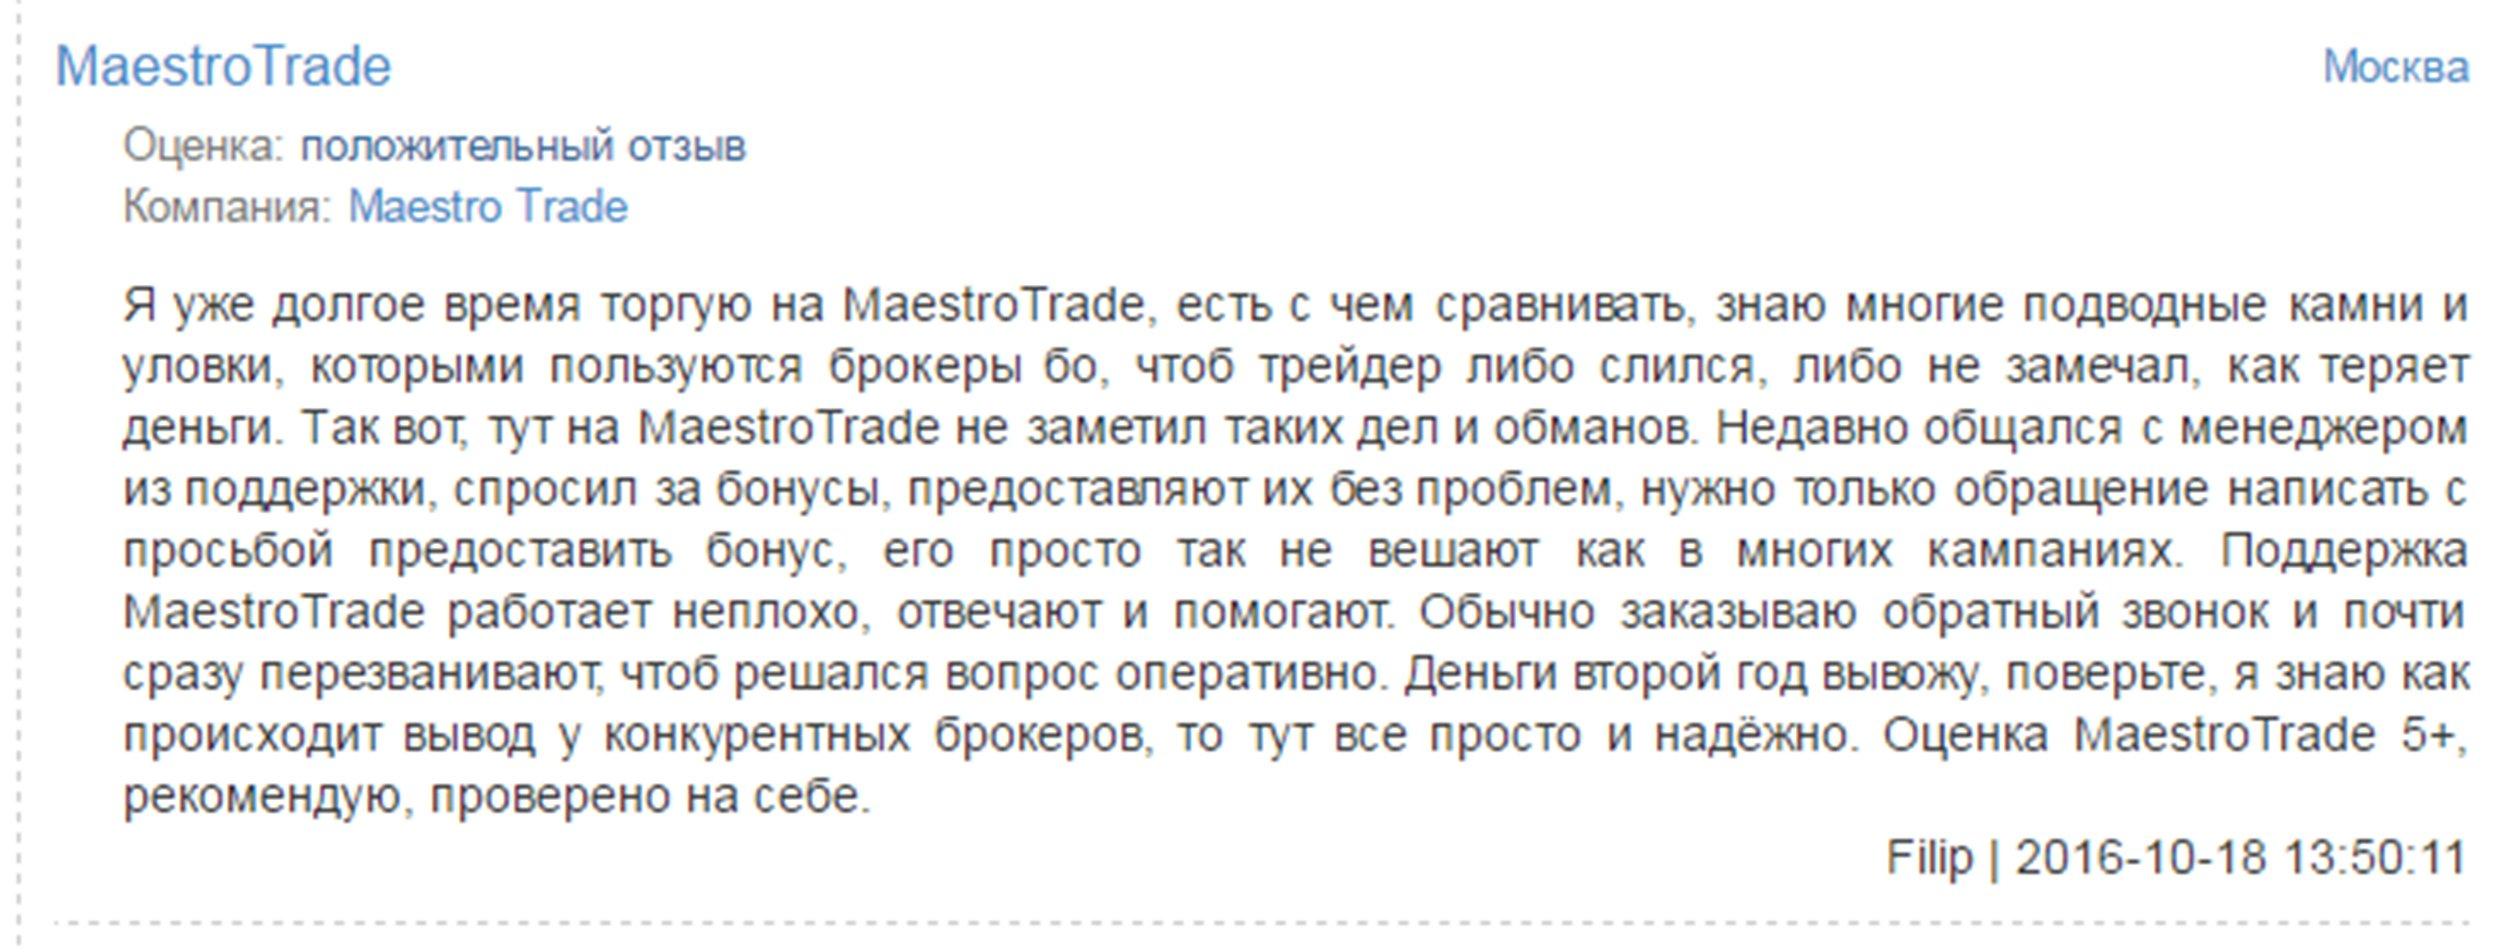 Отзывы о Maestrotrade